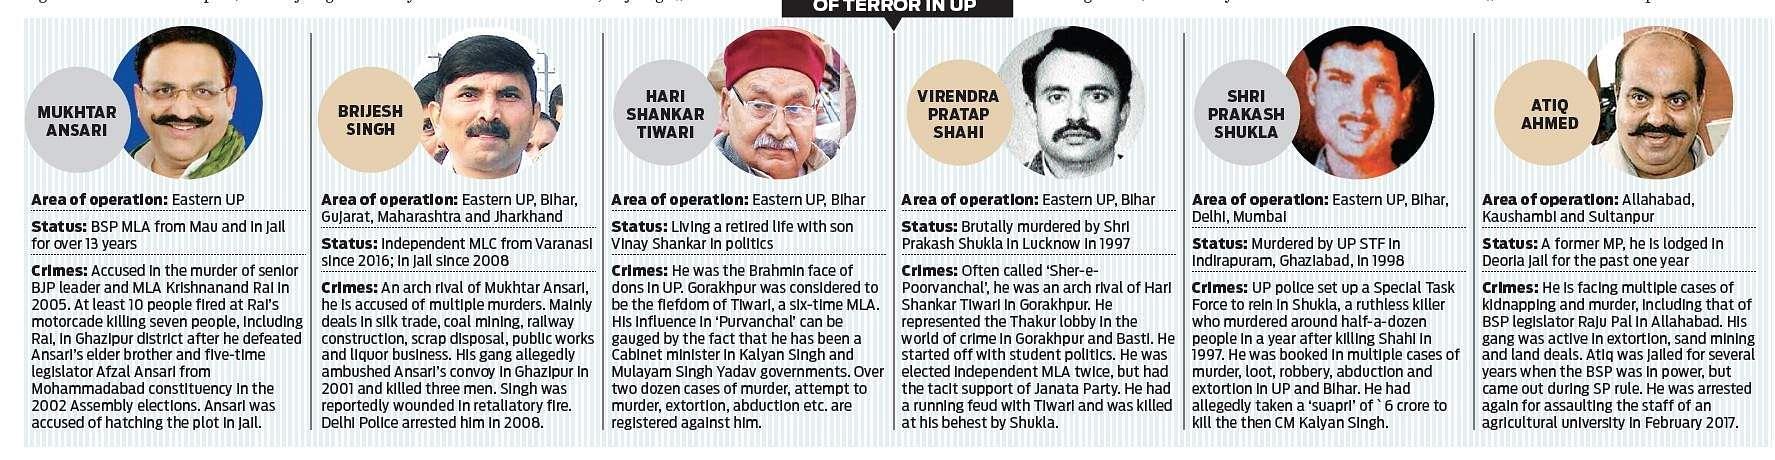 Munna Bajrangi's killing: Another chapter in Uttar Pradesh's history